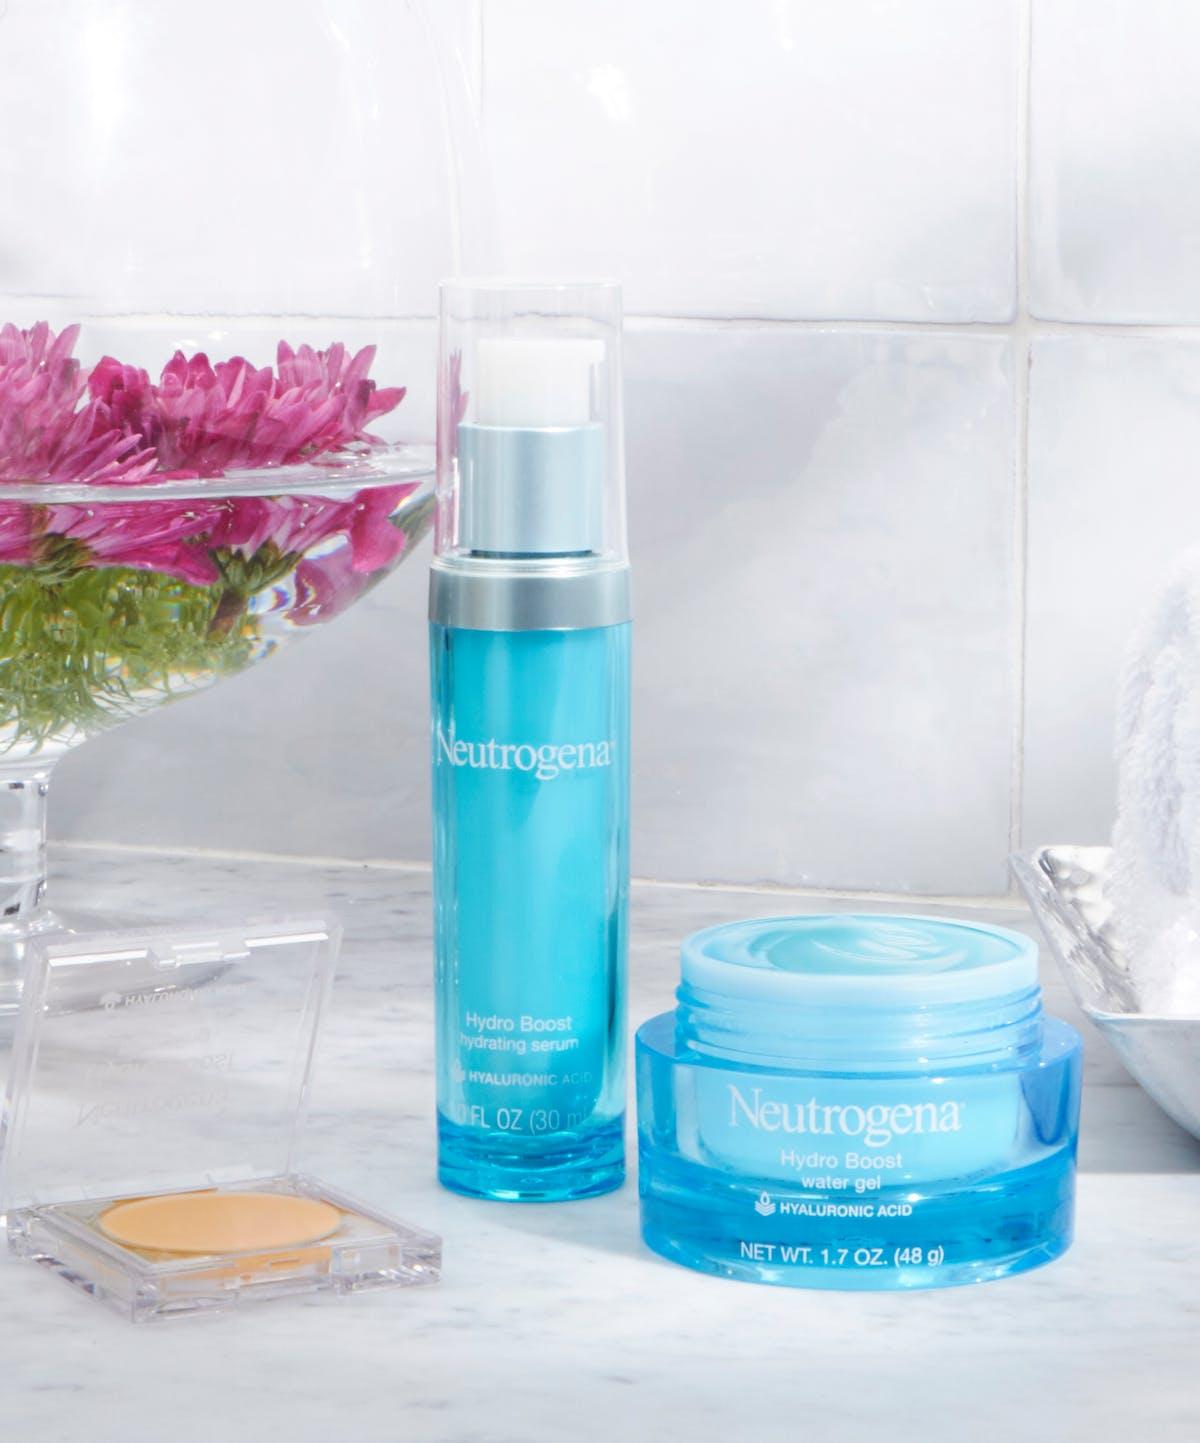 46d6bdfd3c0 Hydro Boost Hydrating Face Serum with Hyaluronic Acid | NEUTROGENA®